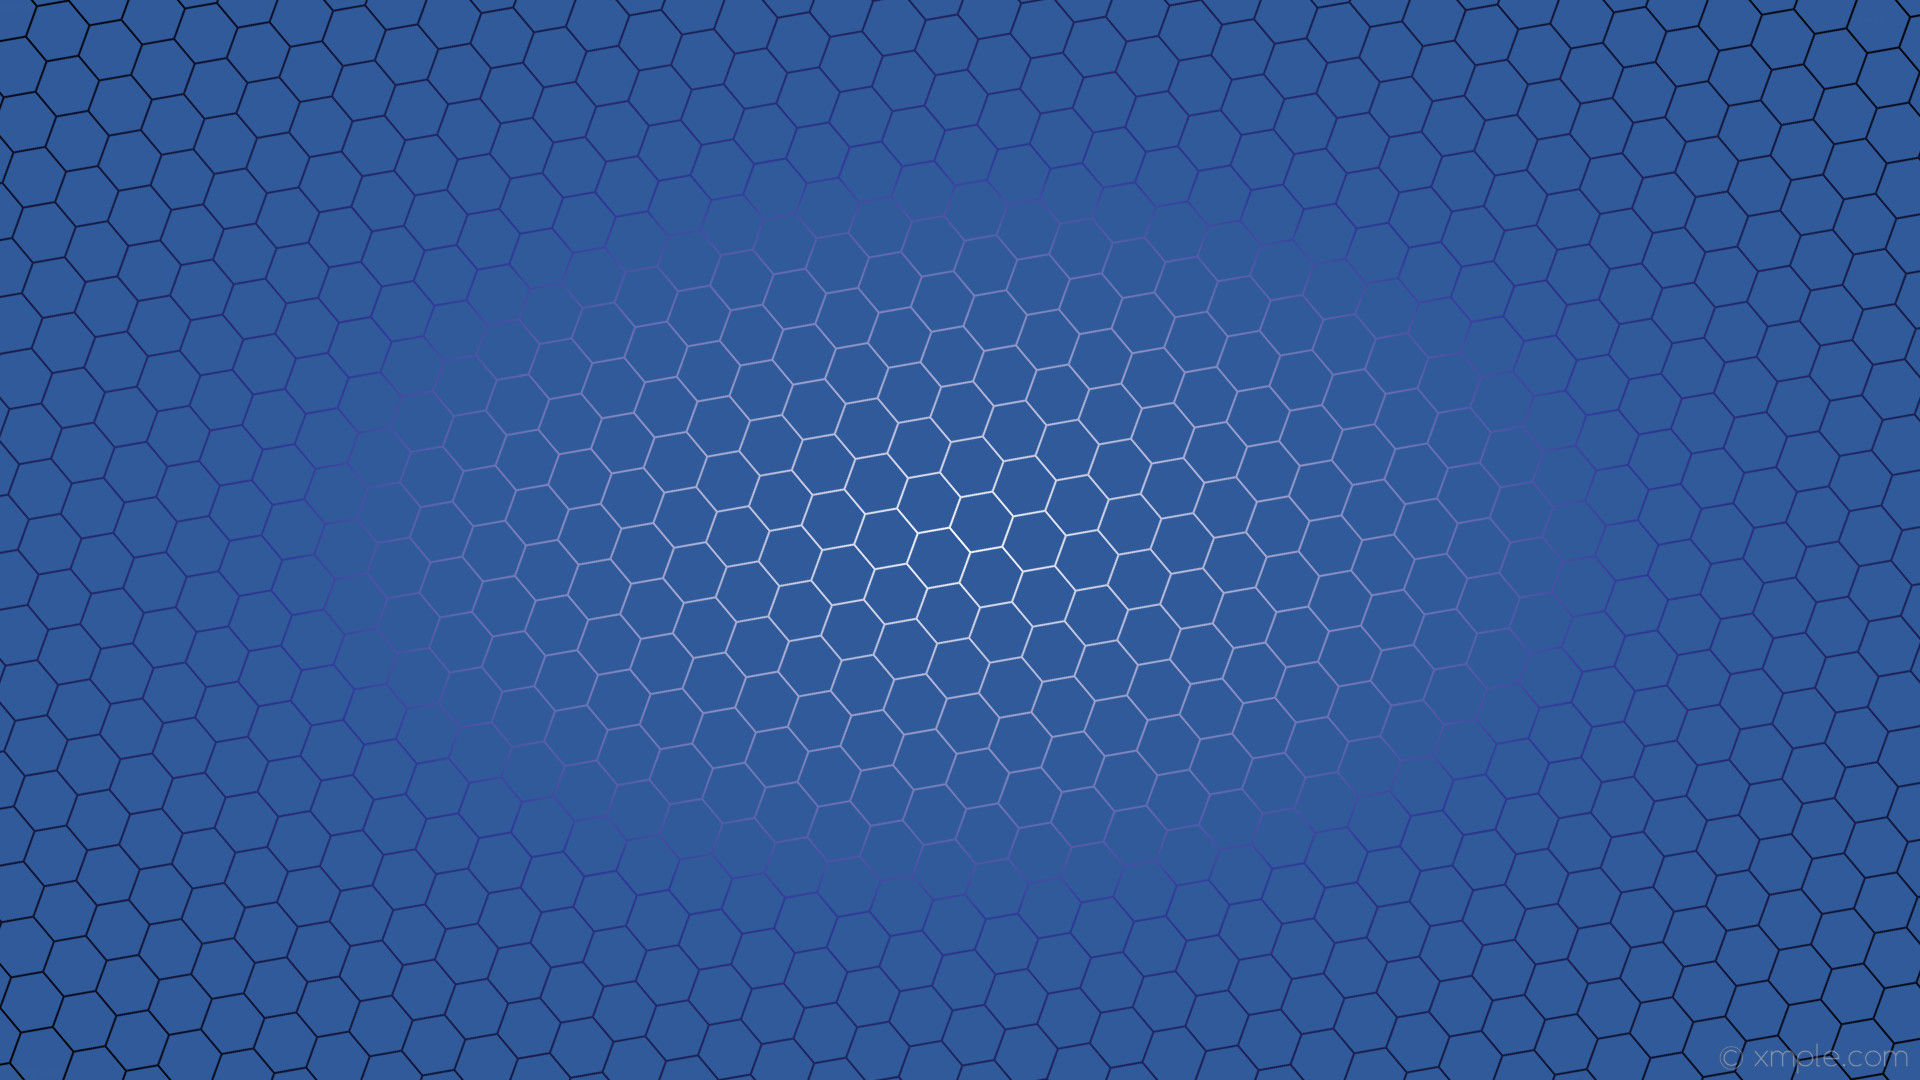 wallpaper black blue hexagon white azure glow gradient #305a99 #ffffff  #303a99 diagonal 40